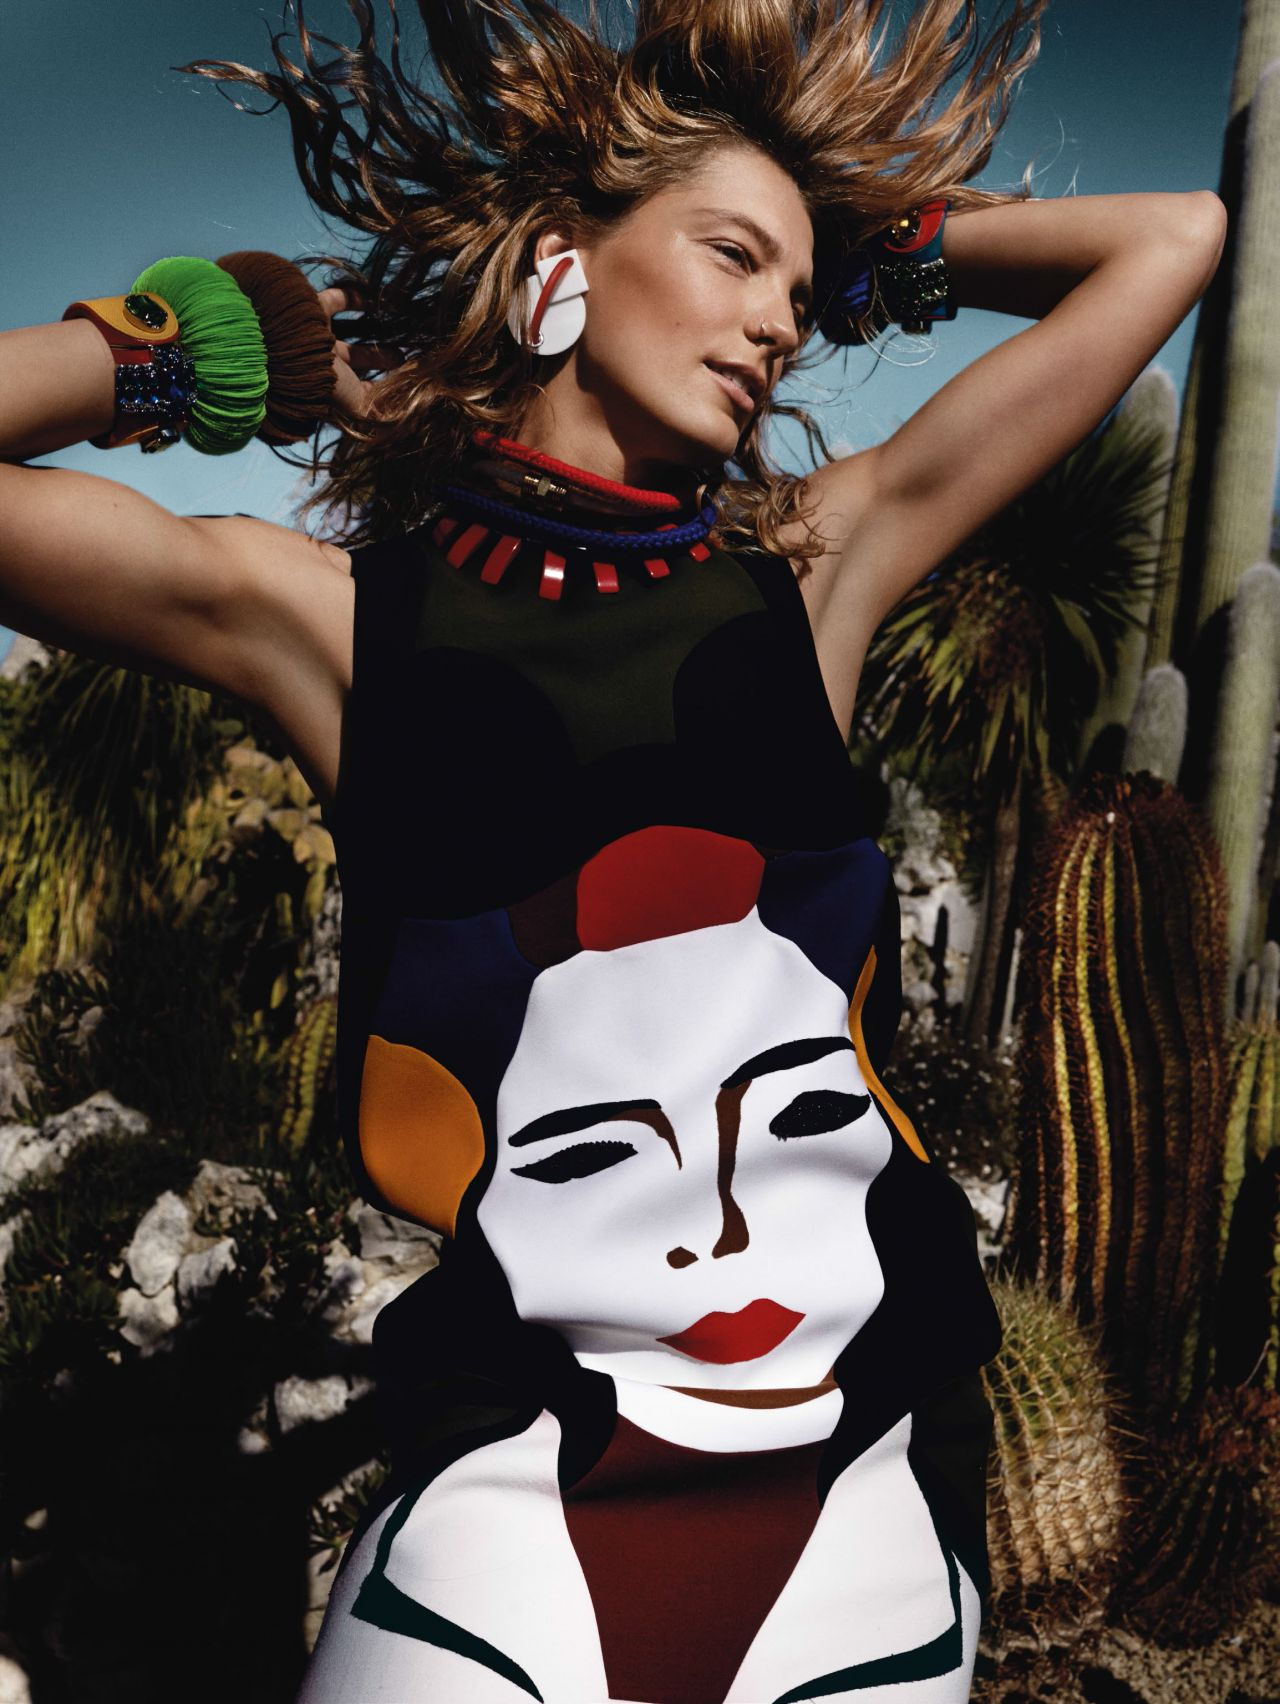 Daria Werbowy - Vogue Magazine (UK) - March 2014 - Photos by Mario Testino